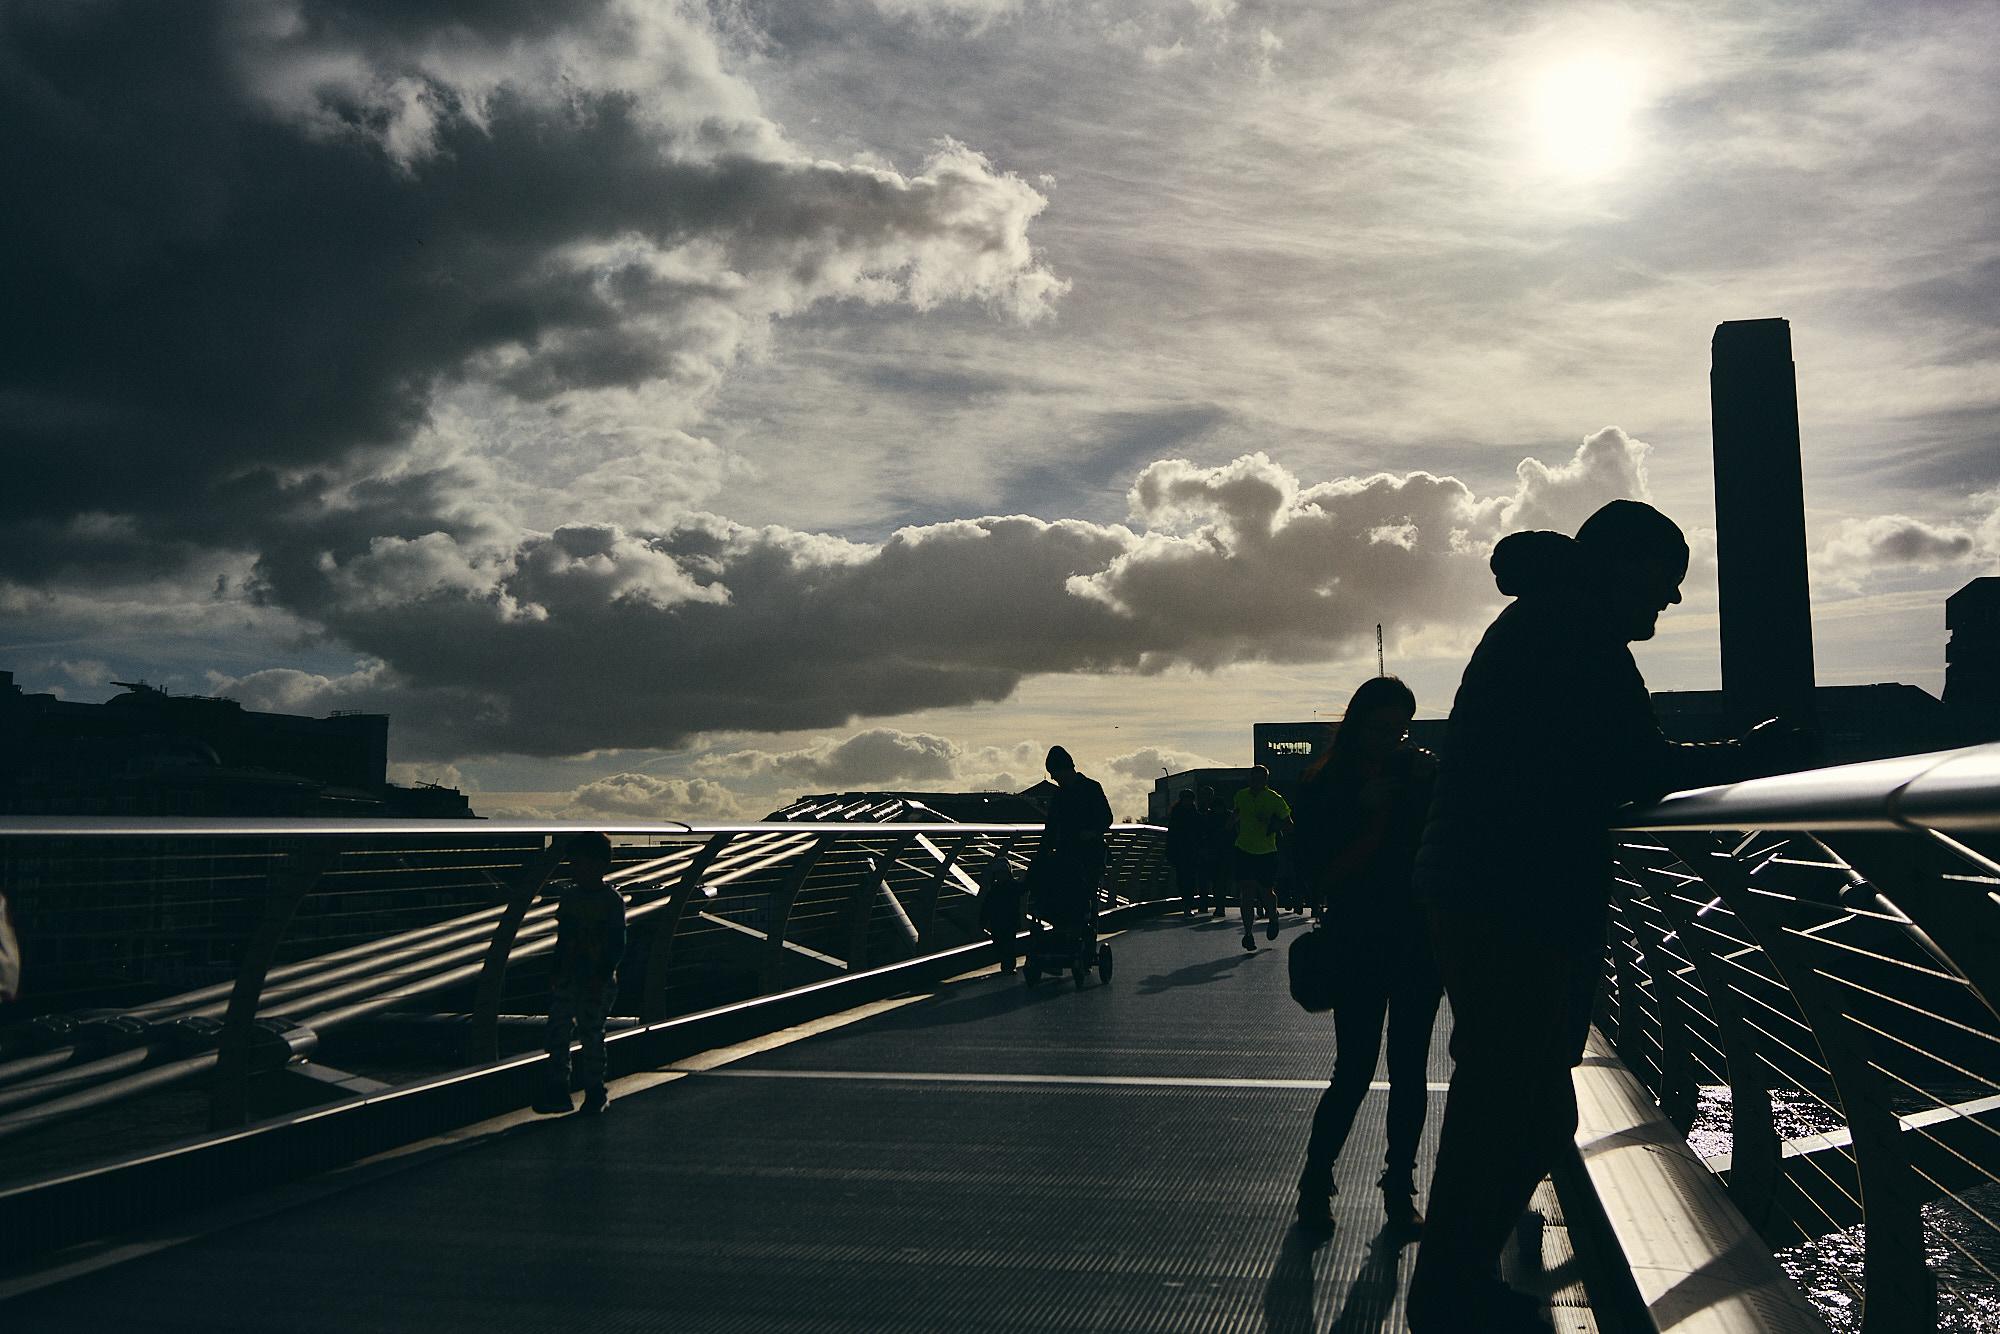 sony a7r street photography london river